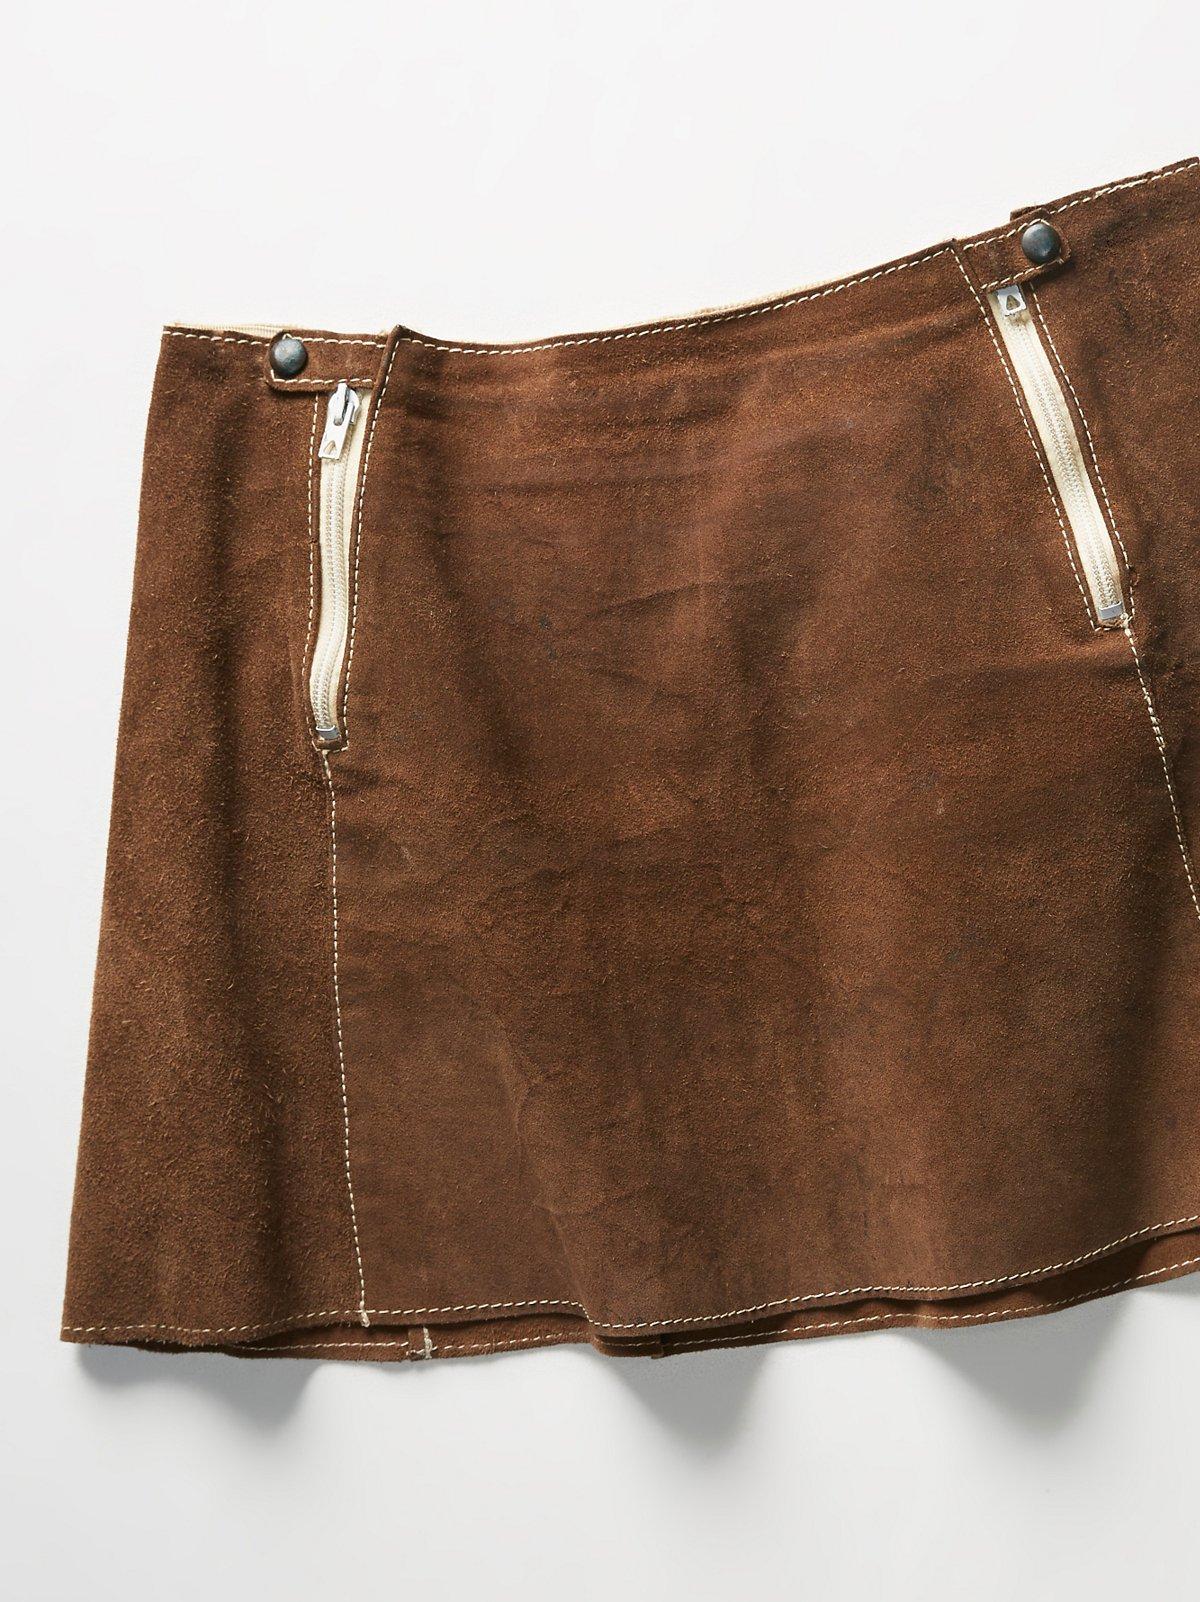 Vintage 1960s Suede Skirt